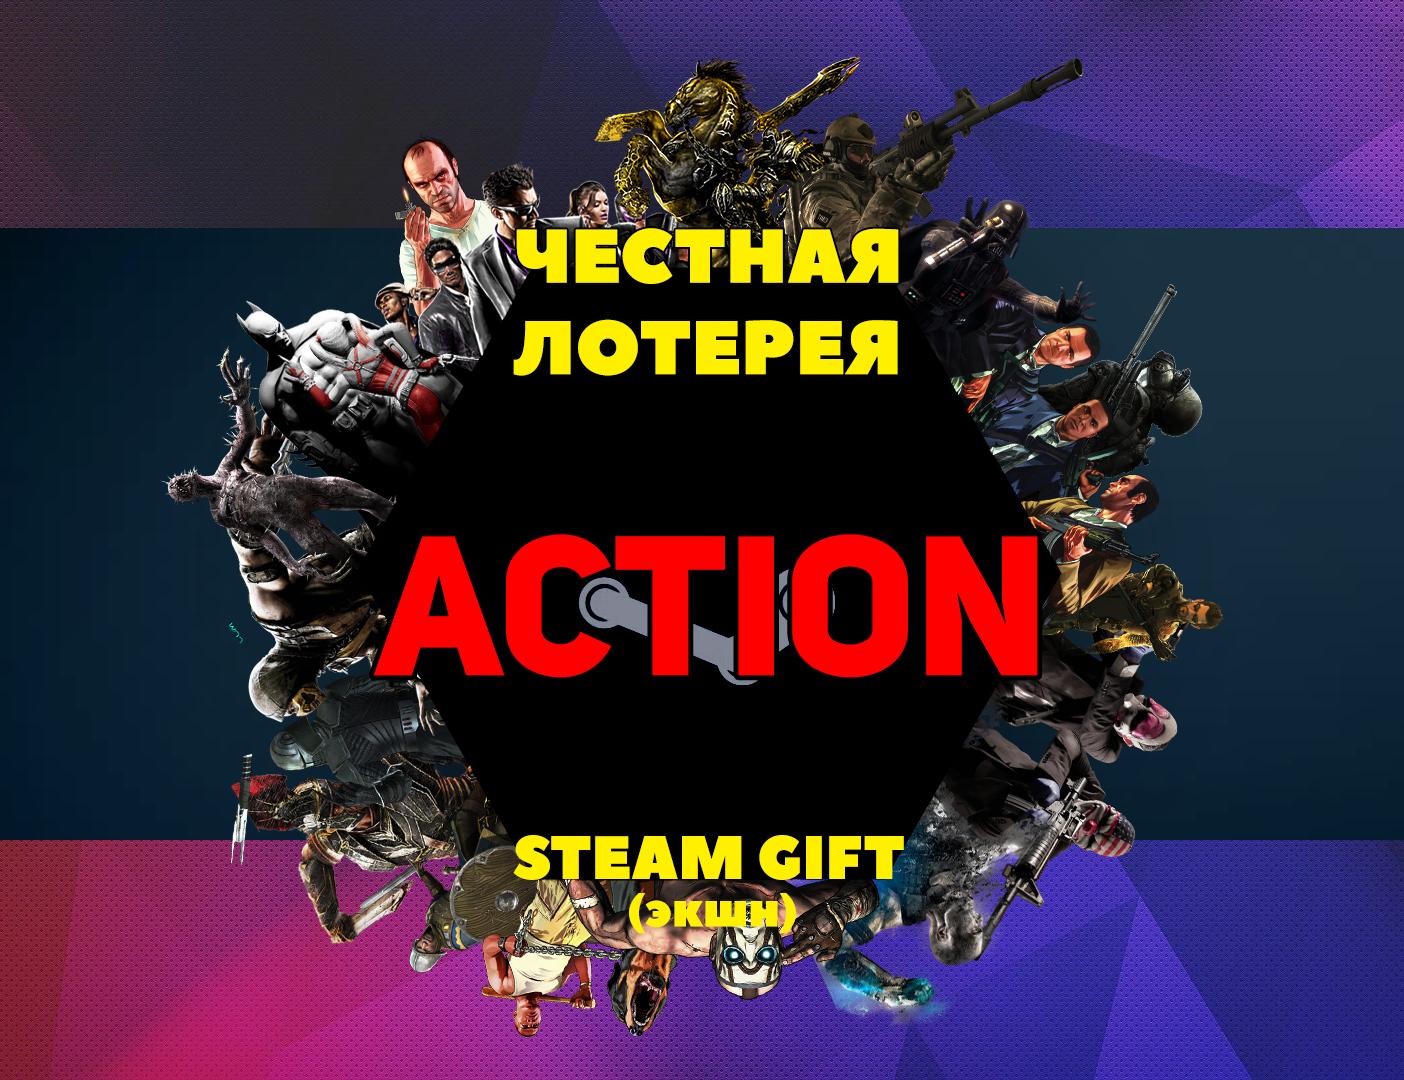 Честная лотерея GIFT Steam [ACTION]